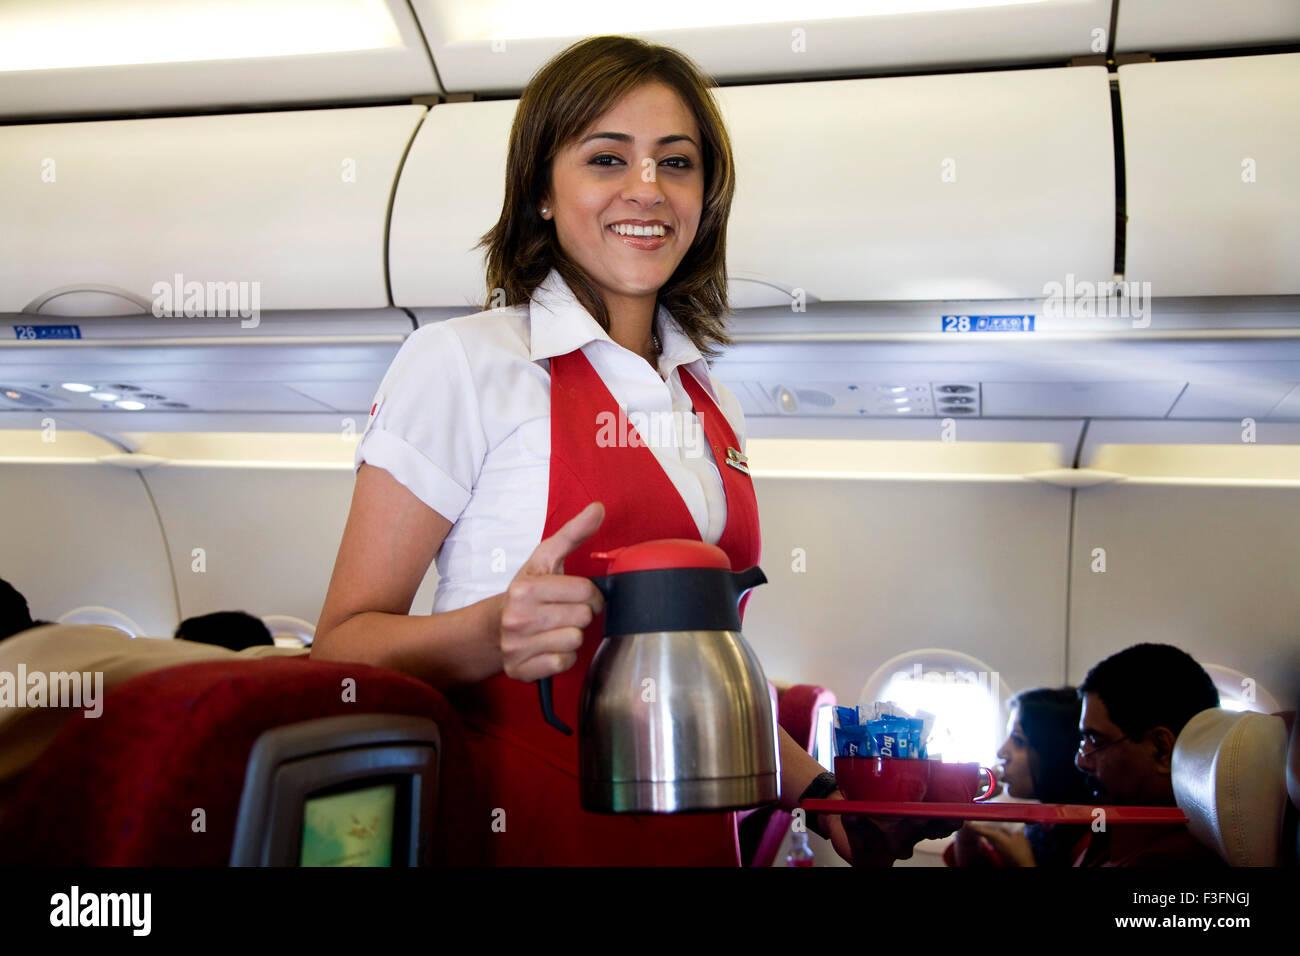 cabin-crew-serving-tea-coffee-passengers